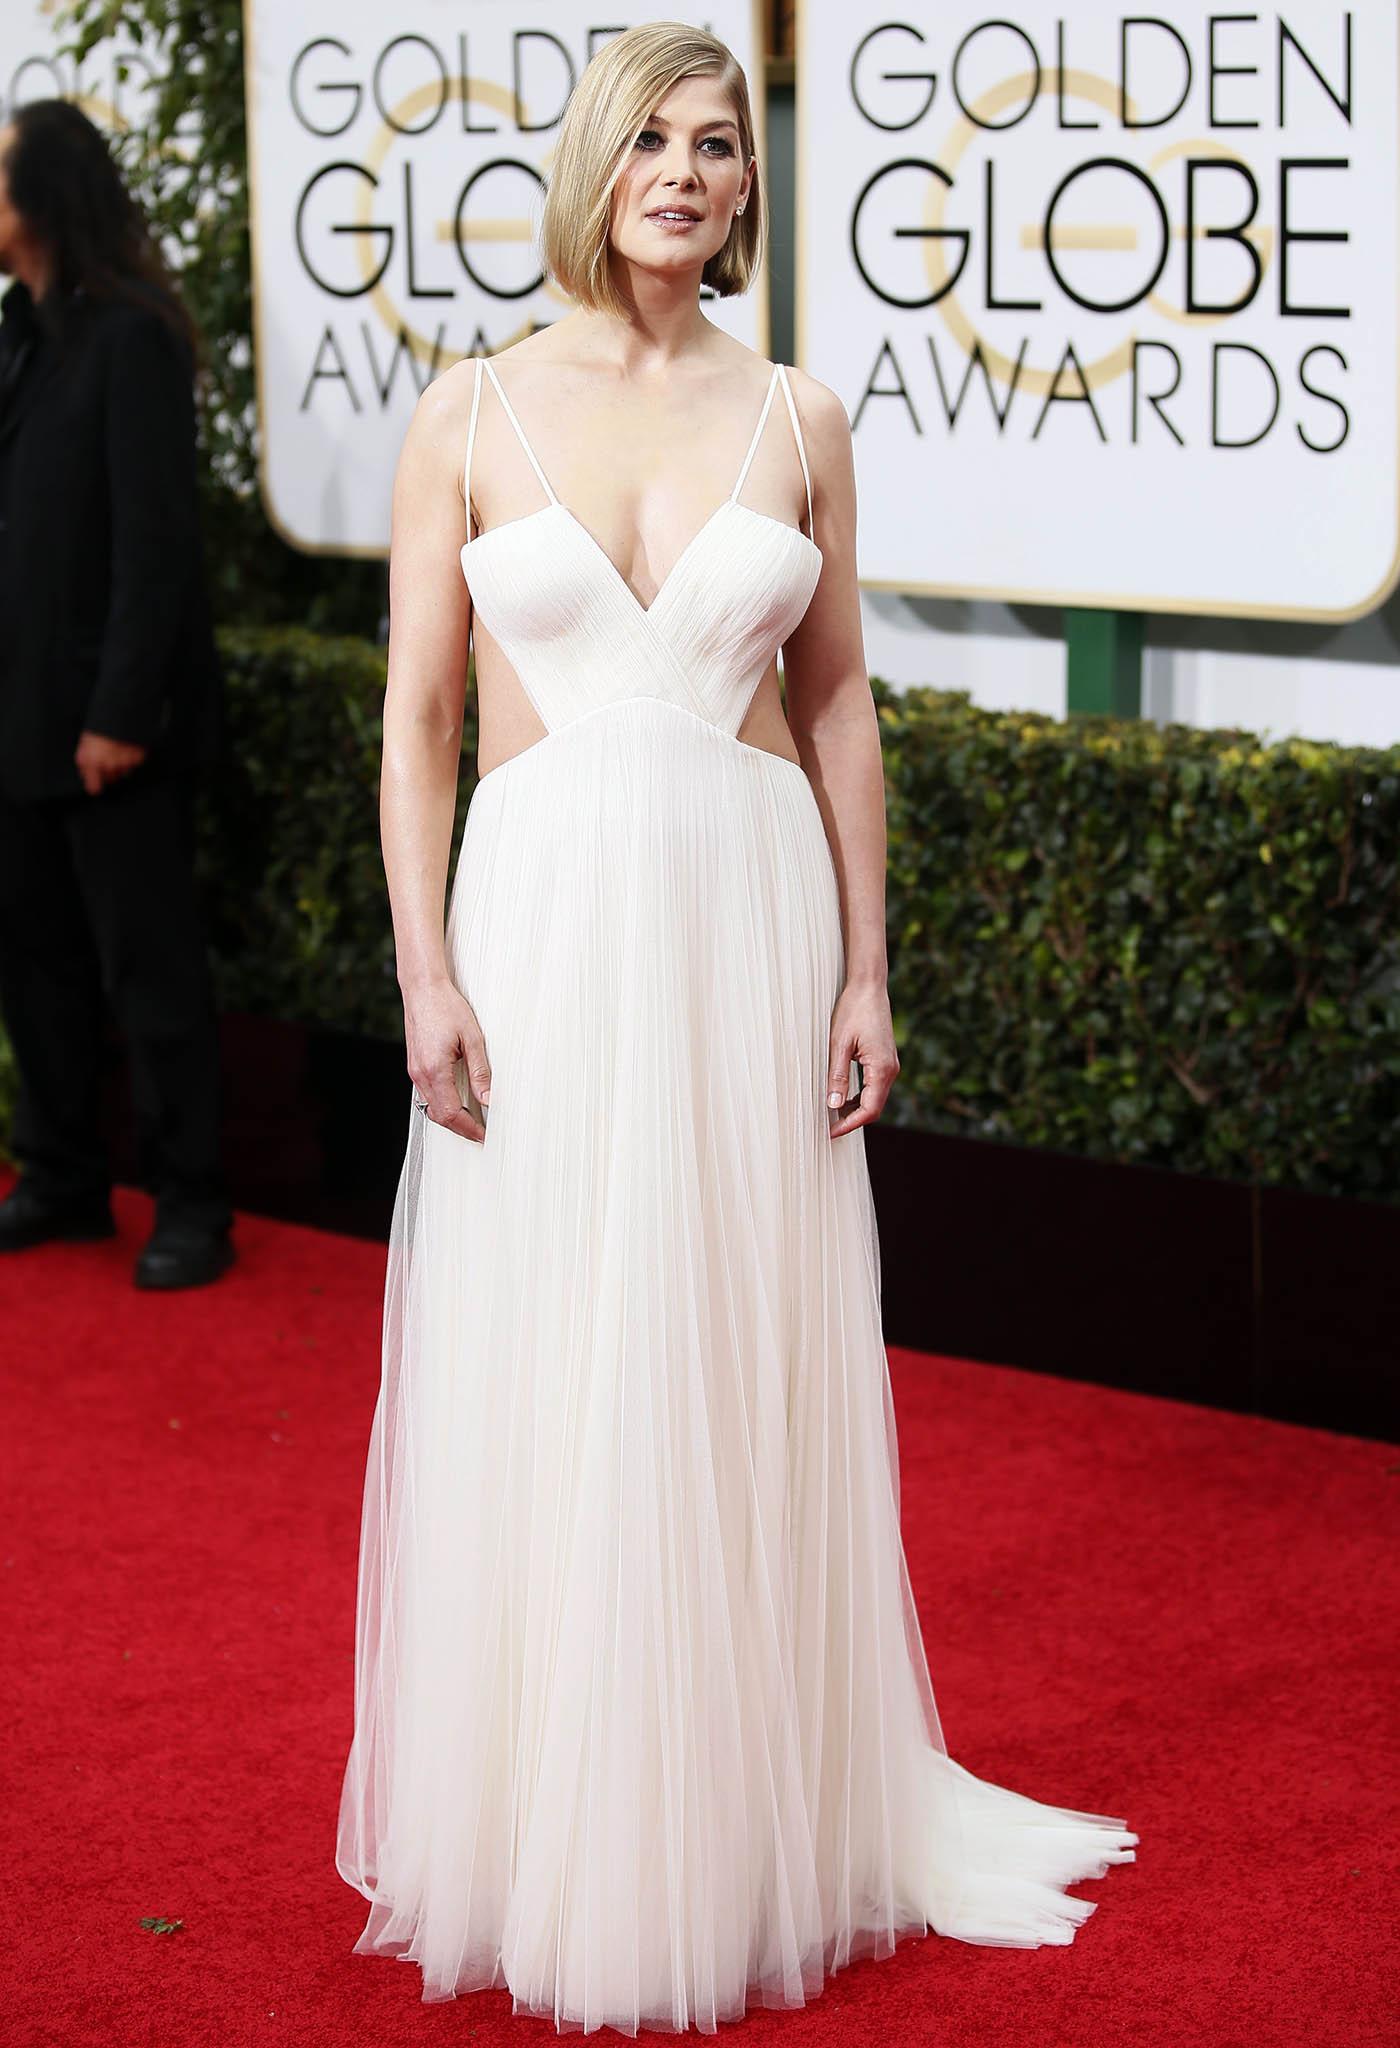 Golden Globe Awards, Rosamund Pike